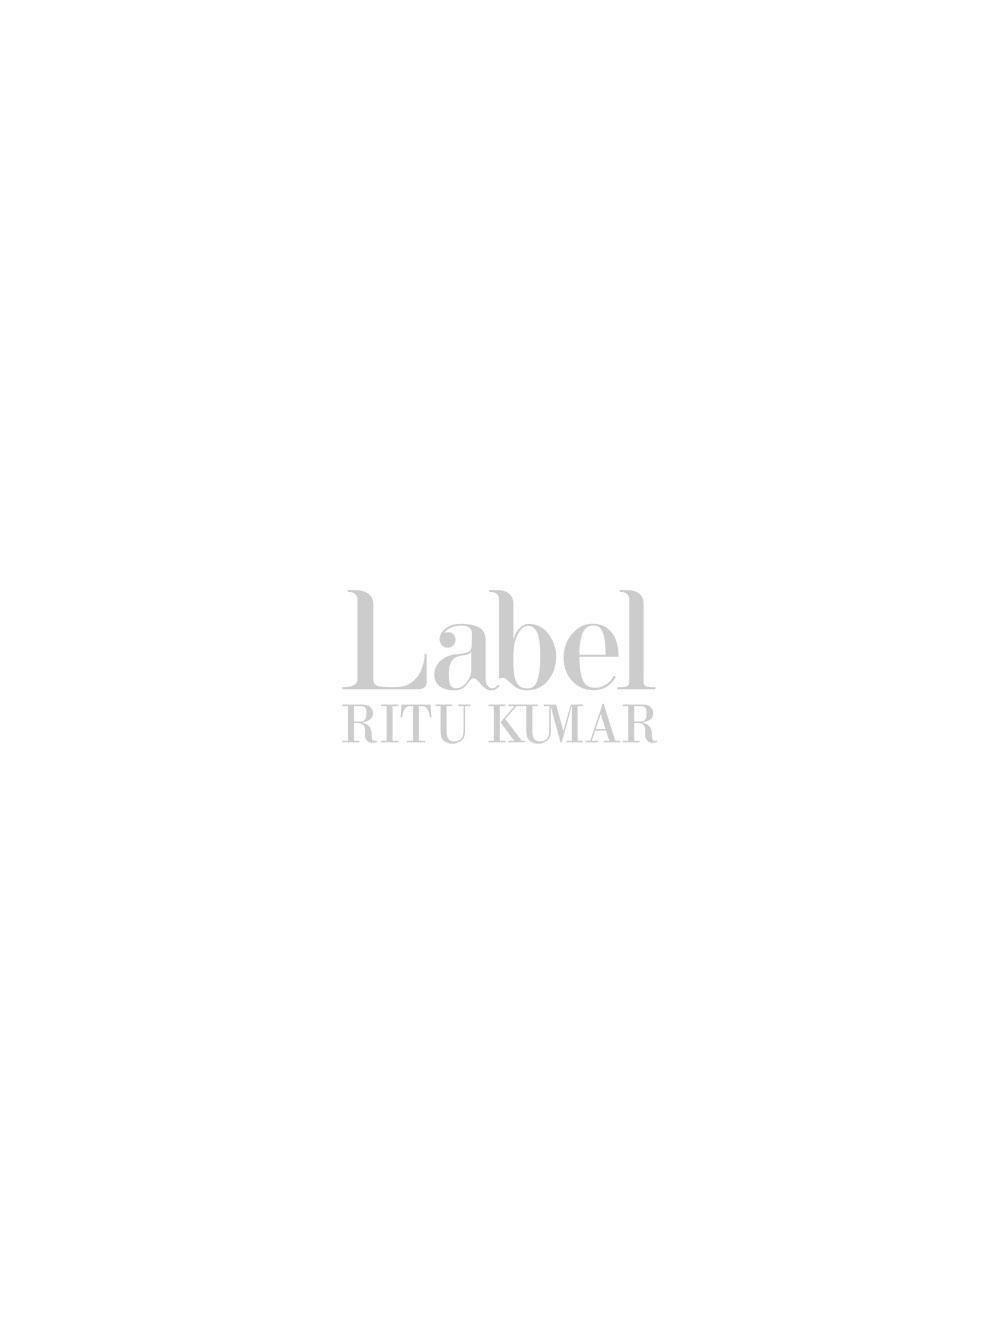 Embroidered Denim Dress by Label Ritu Kumar